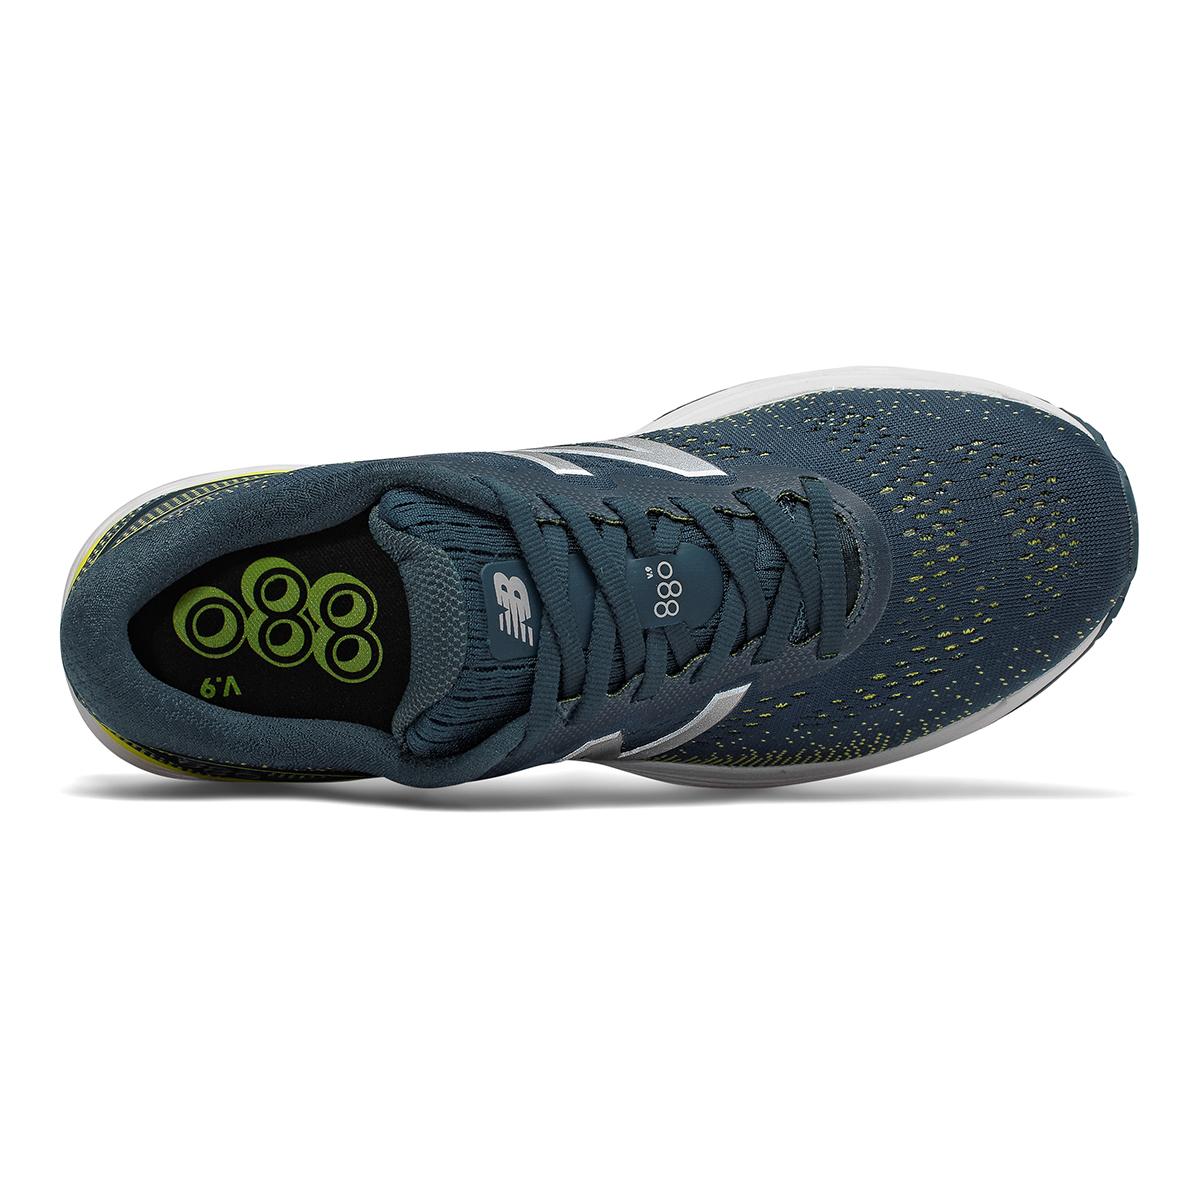 Men's New Balance 880V9 Running Shoe - Color: Supercell / Orion Blue / Sulphur Yellow (Regular Width) - Size: 8.5, Supercell / Orion Blue / Sulphur Yellow, large, image 4